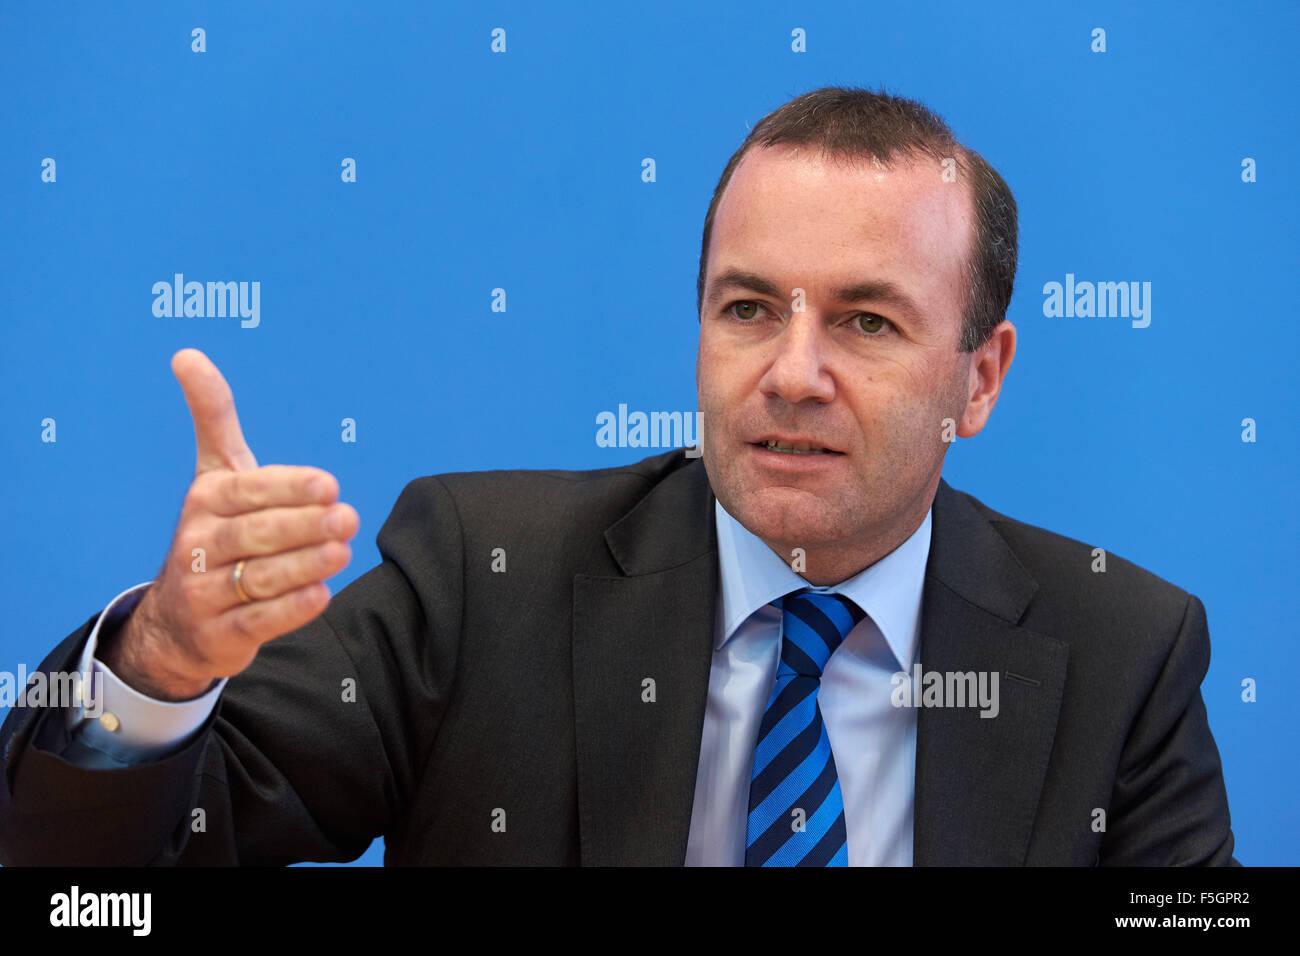 15.09.2015, Berlin, Deutschland - Pressekonferenz zum Thema: Wie Europa die Fluechtlingsdynamik in den Griff bekommt, Stock Photo